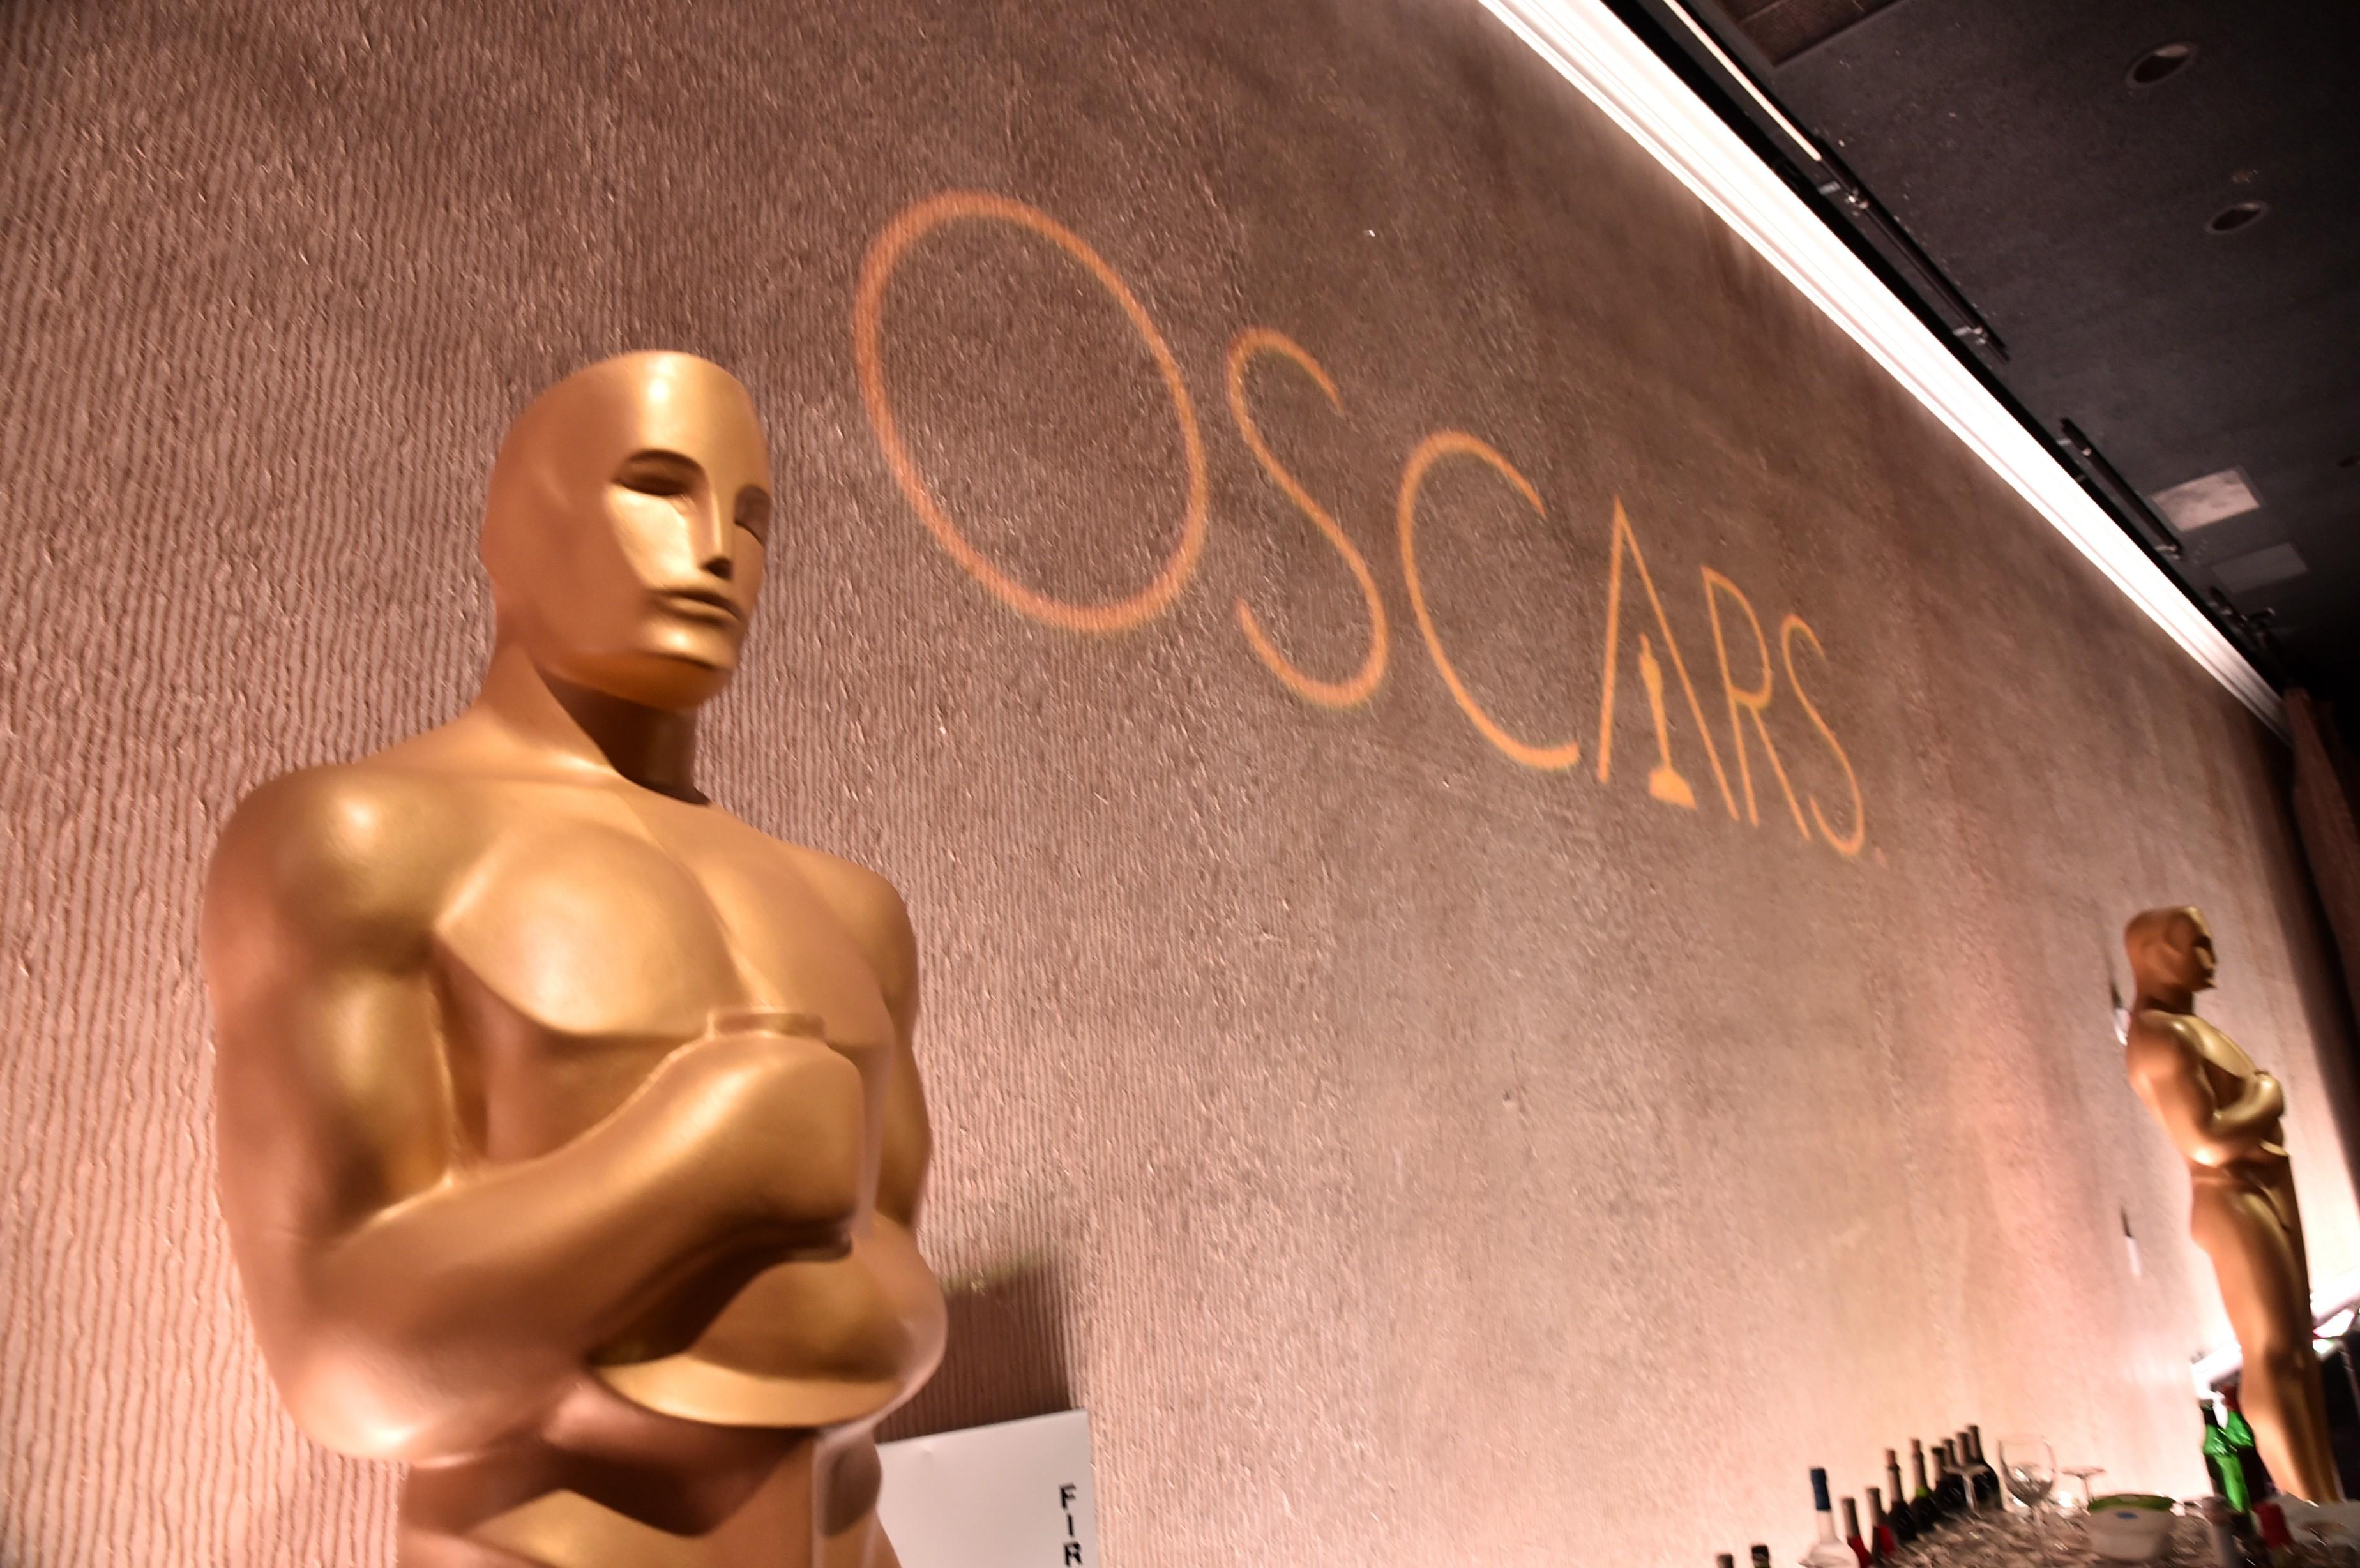 popular film category added to oscars